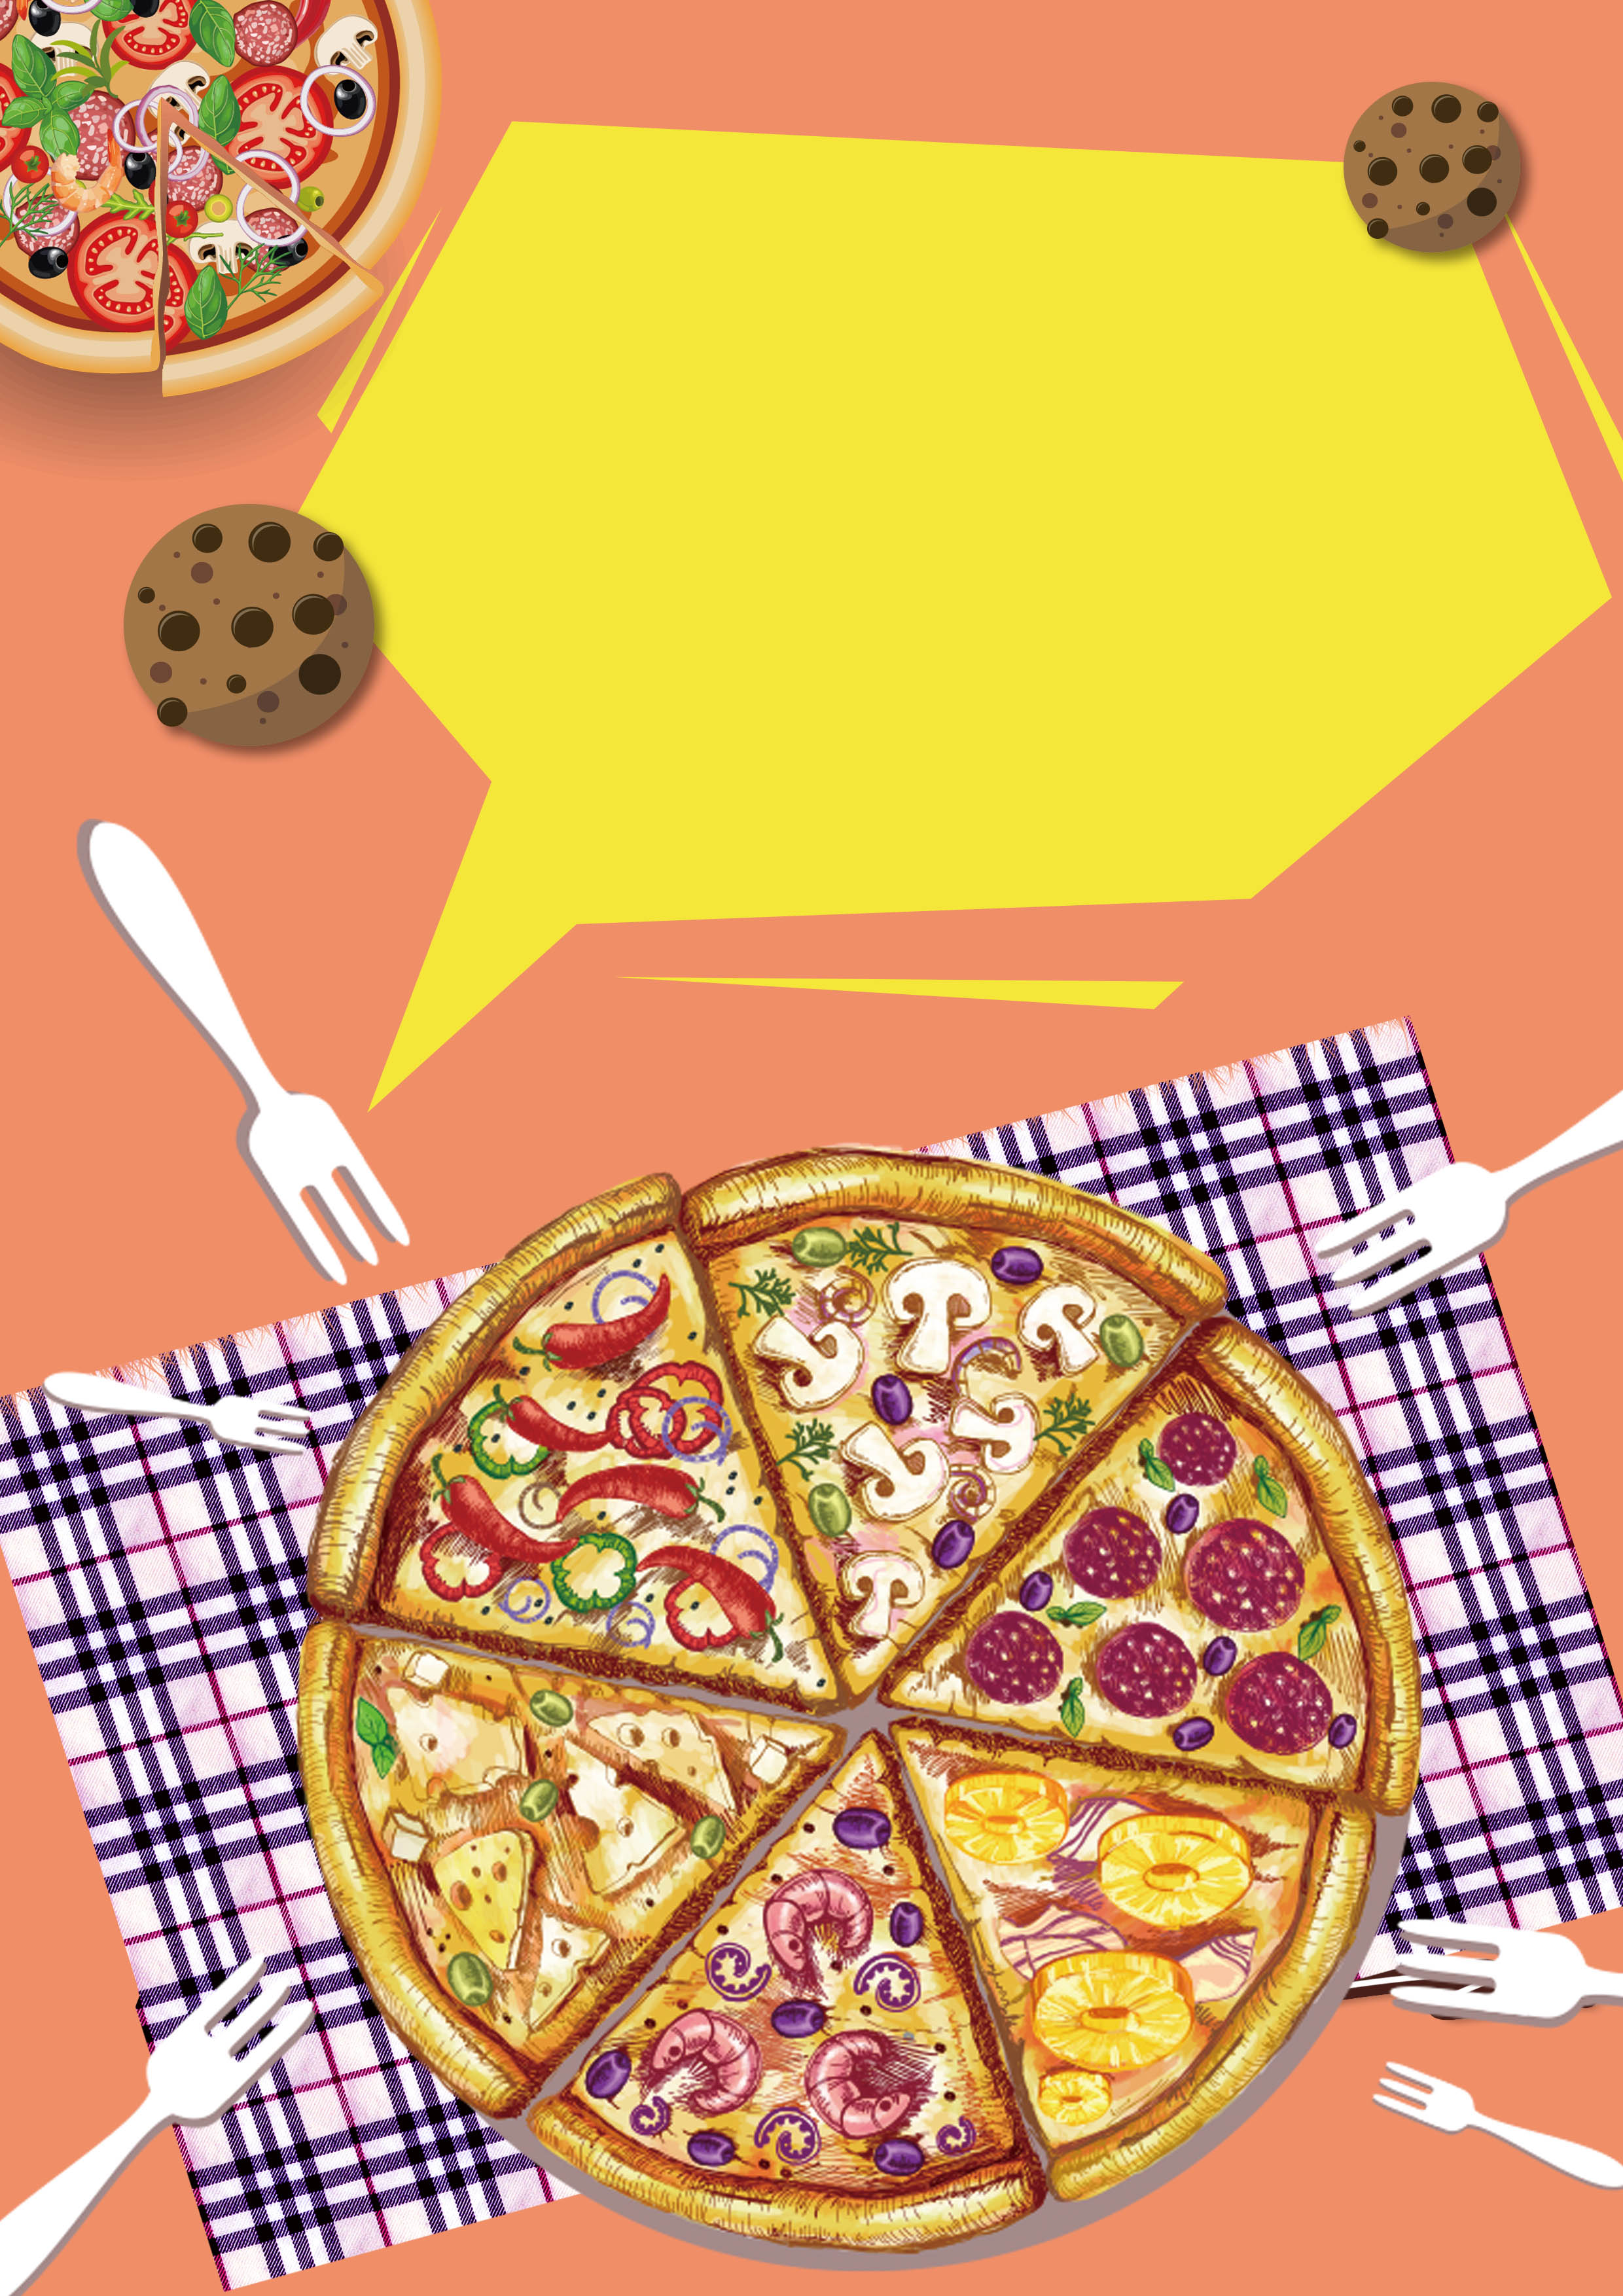 la pizza viene cartel plantilla de fondo la pizza viene